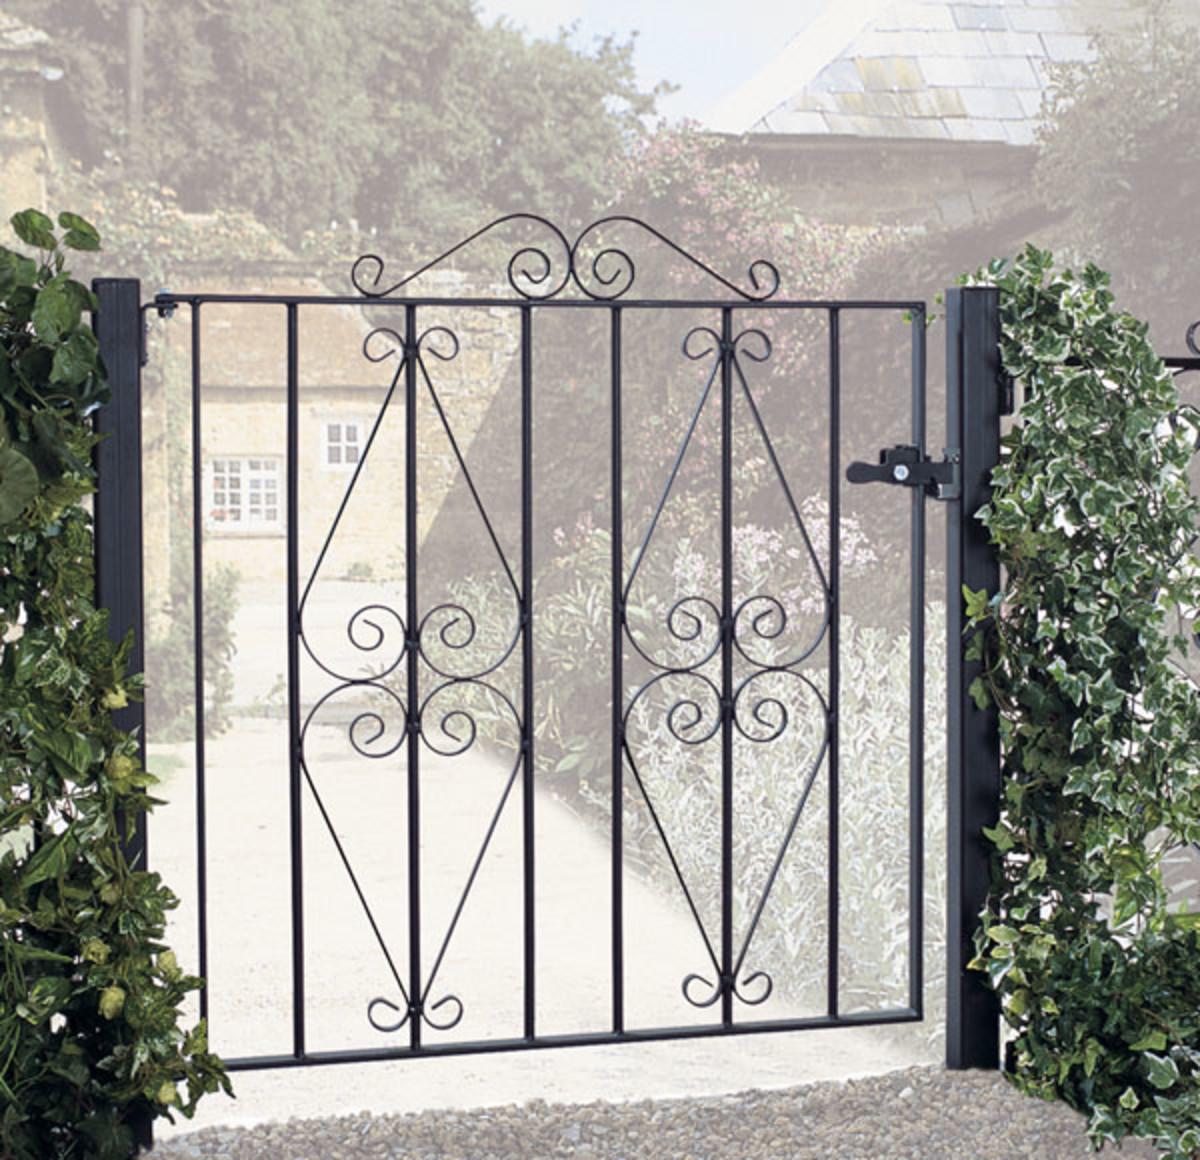 Wrought Iron gates - Single iron gates - Stirling gate